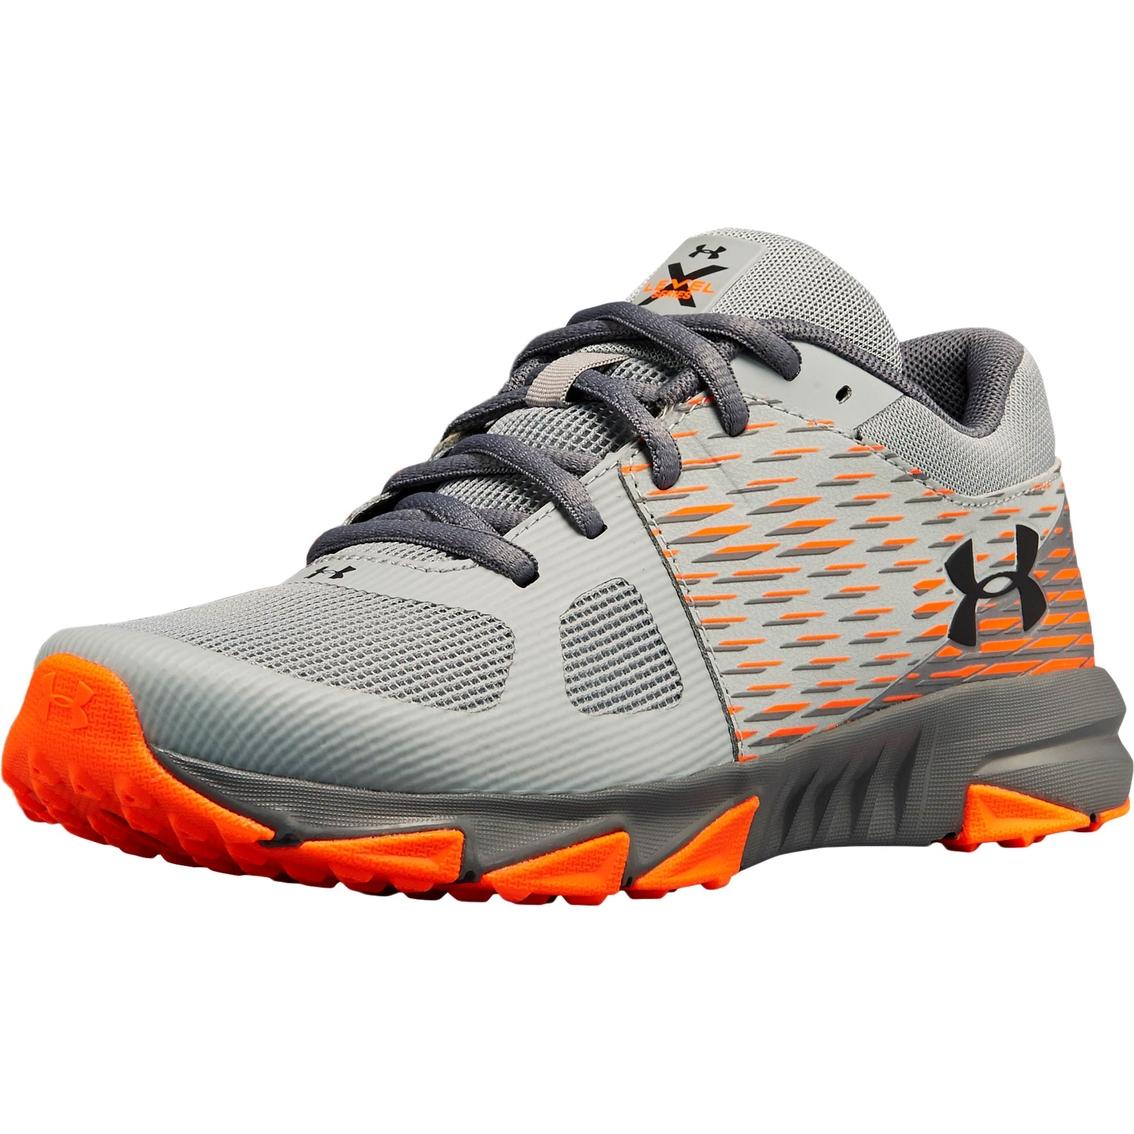 a679e5cd55 Under Armour Boys Ua Bgs X Level Prospect Running Shoes | Children's ...